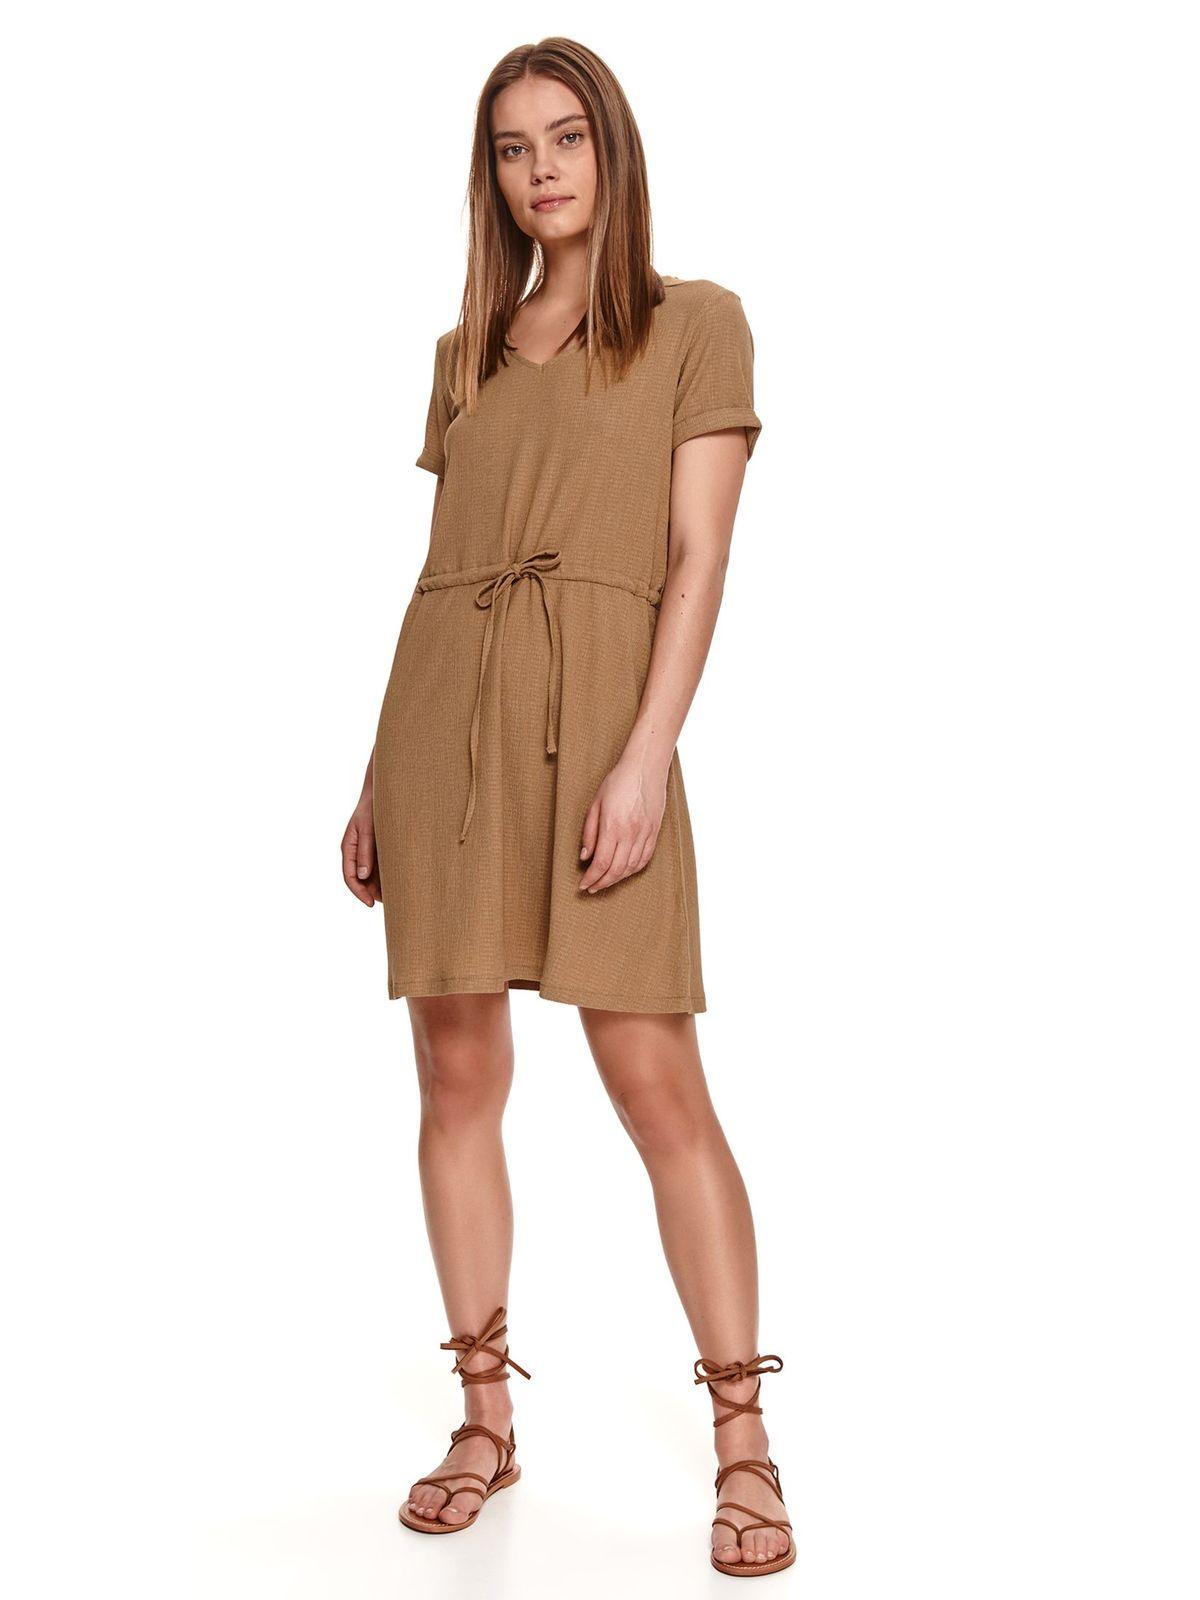 With v-neckline ribbon fastening brown dress